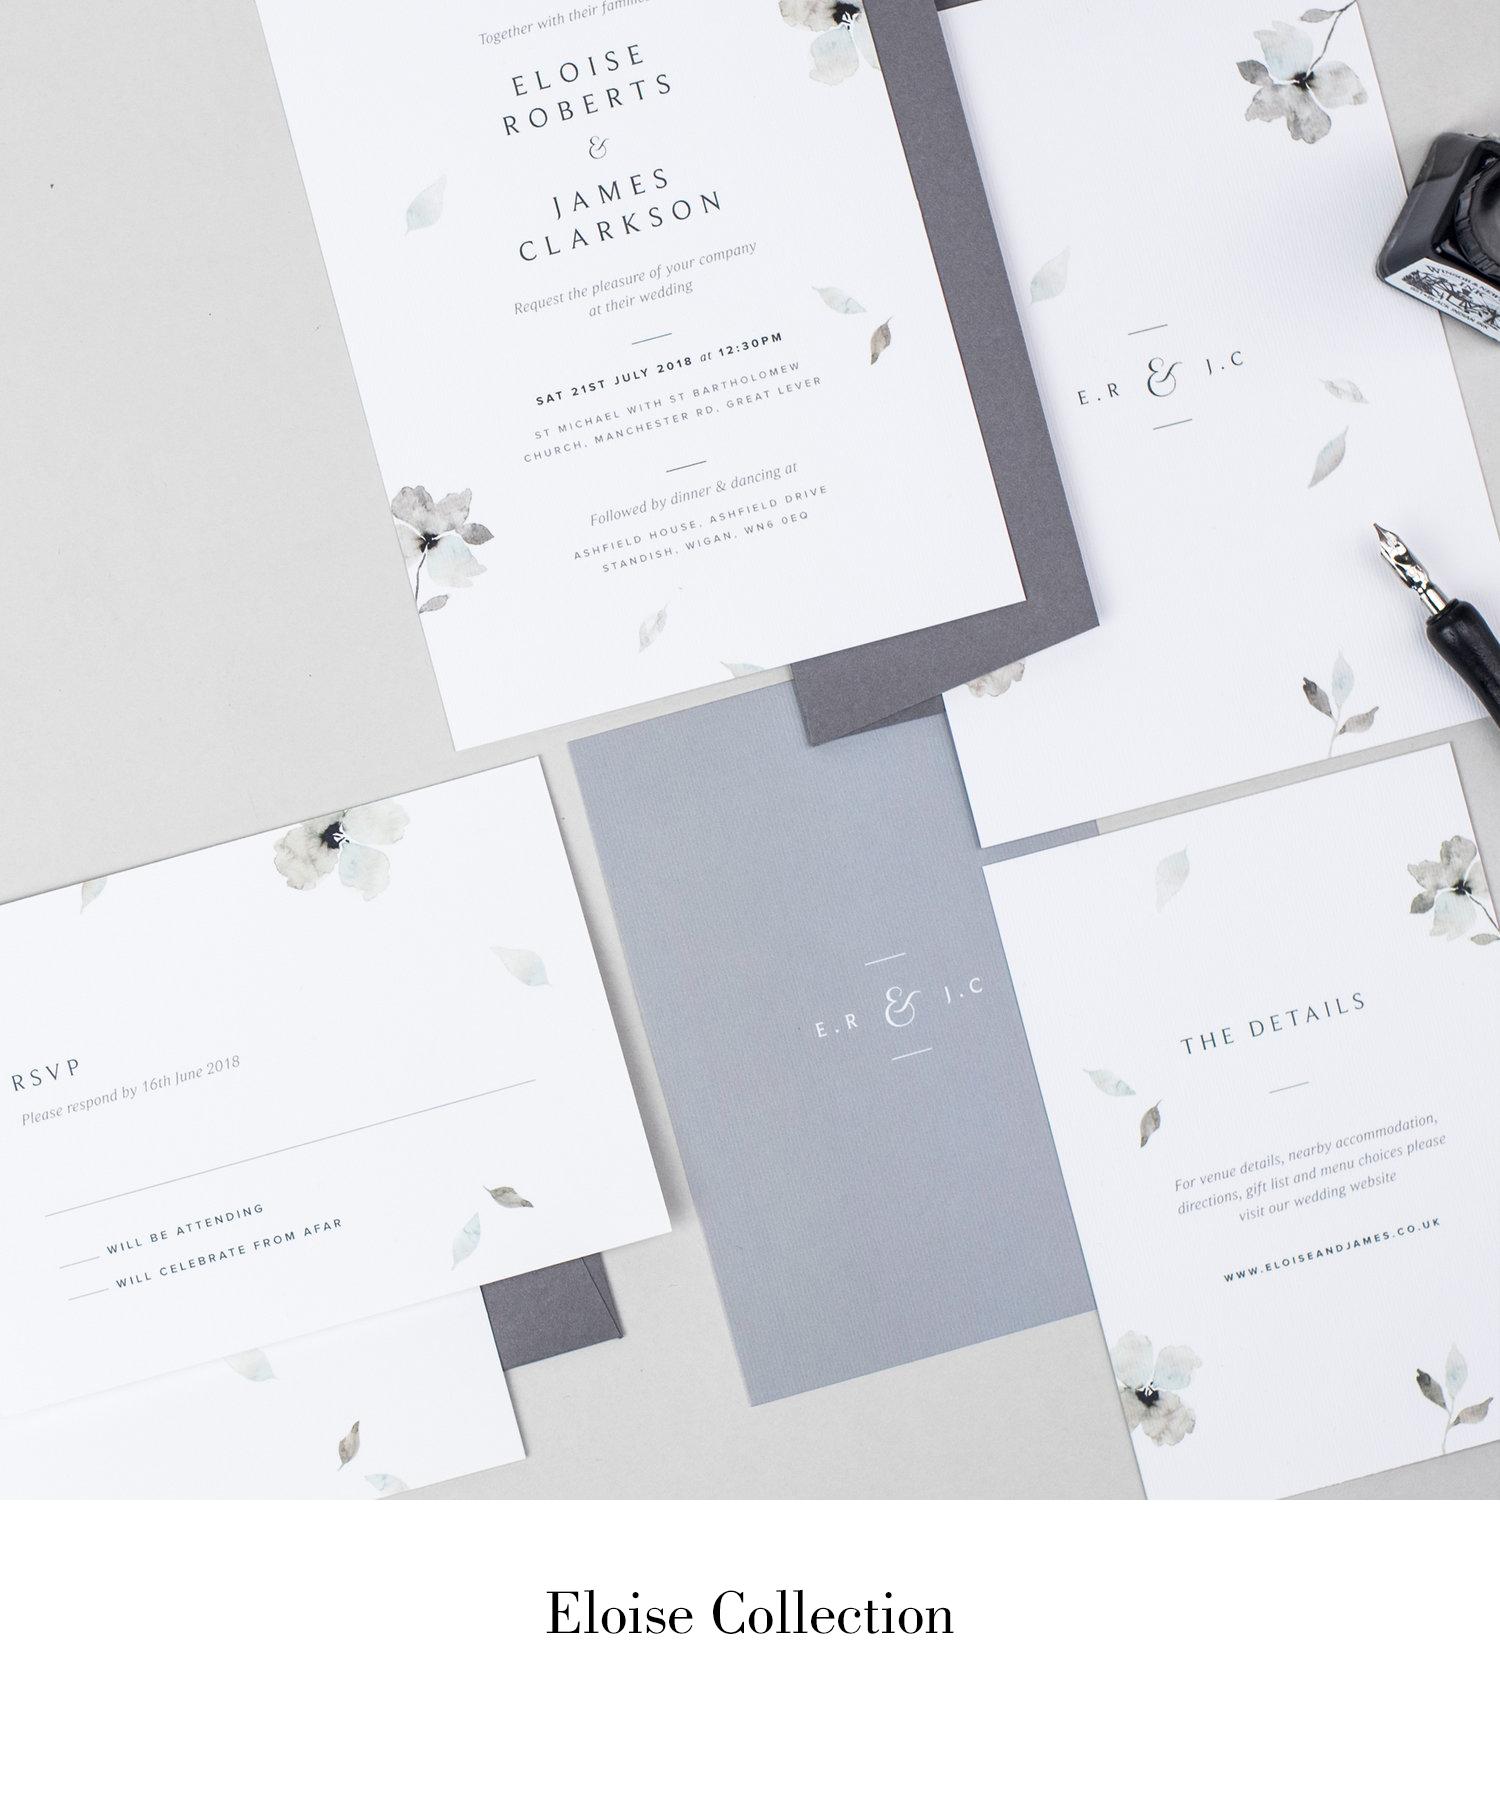 Eloise Collection.jpg